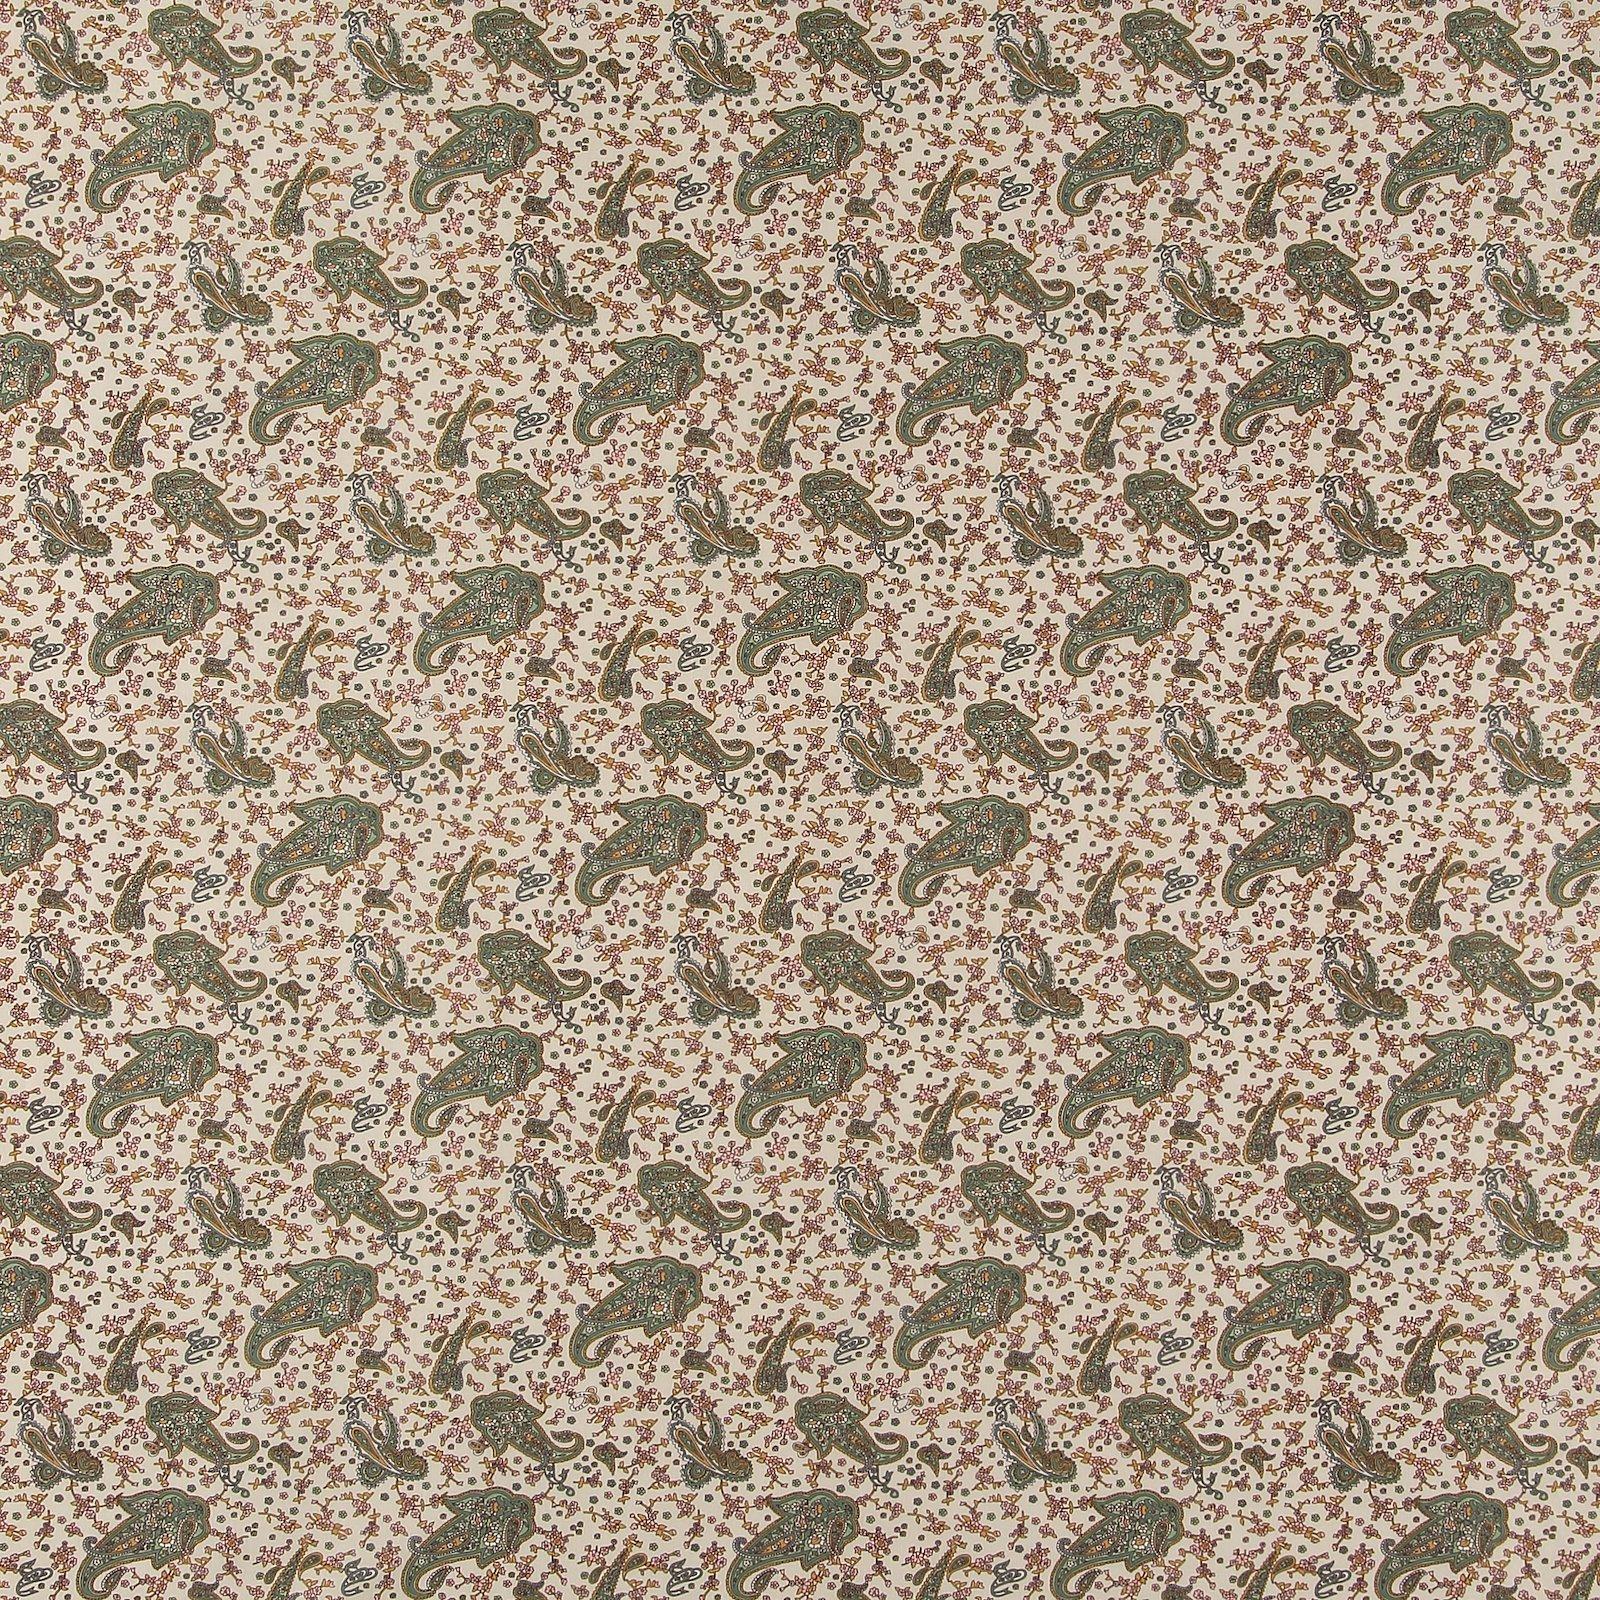 Cotton pastel powder w paisley pattern 852371_pack_sp